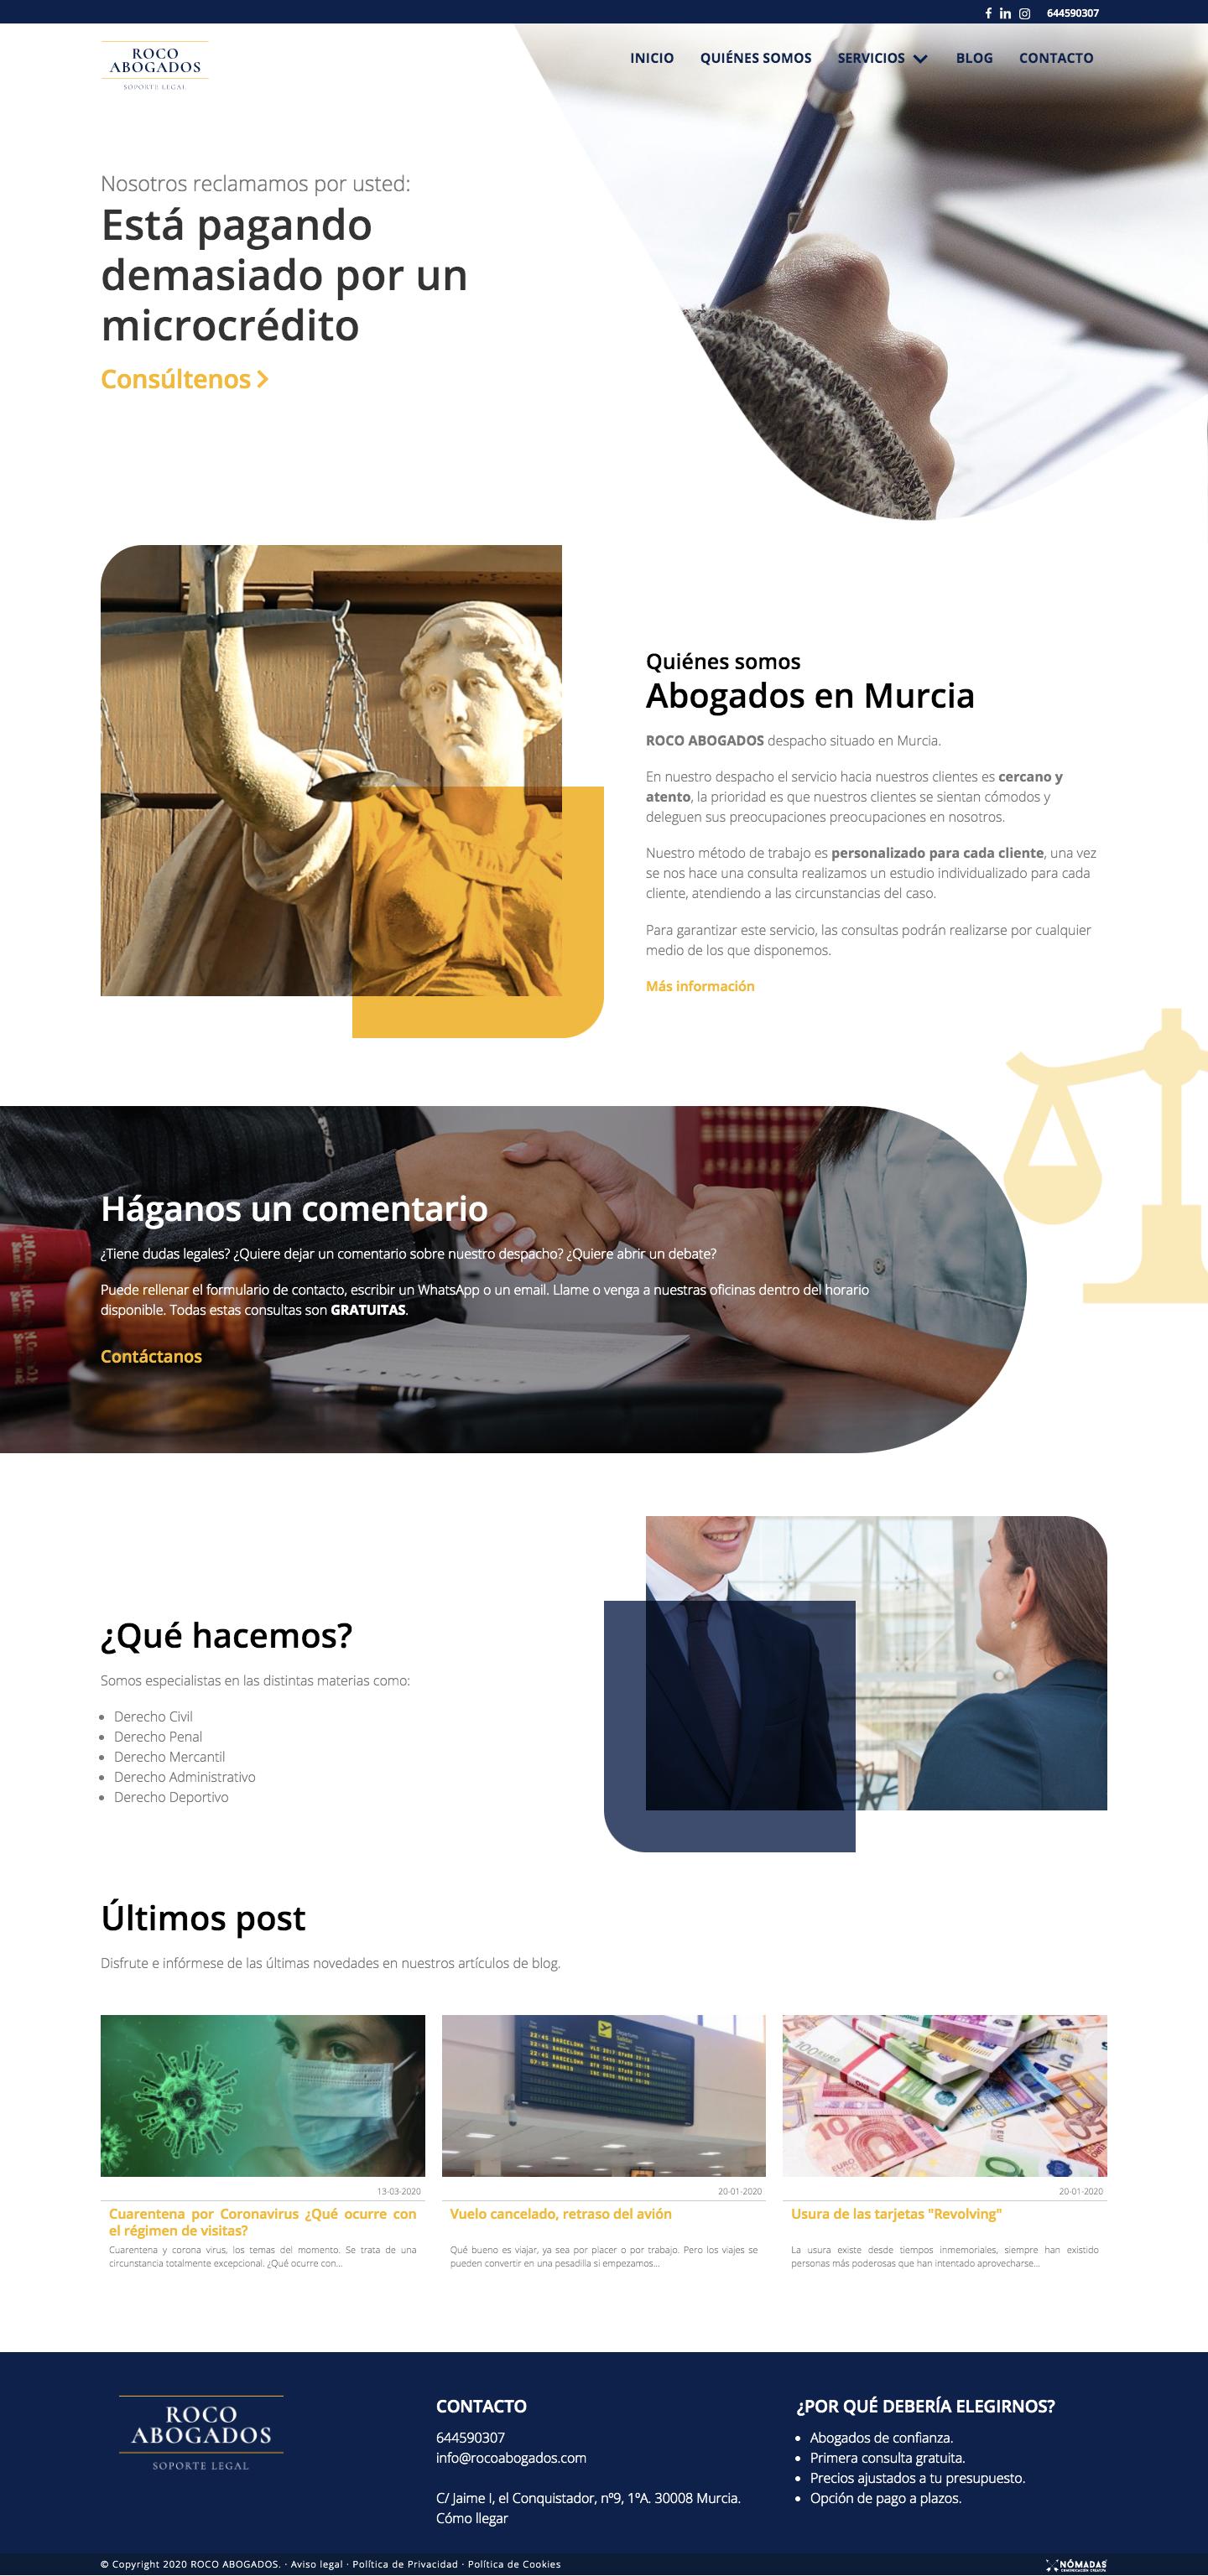 Desarrollado de página web a medida para abogados con Drupal por un programador freelance en Murcia | Nómadas Comunicación Creativa.